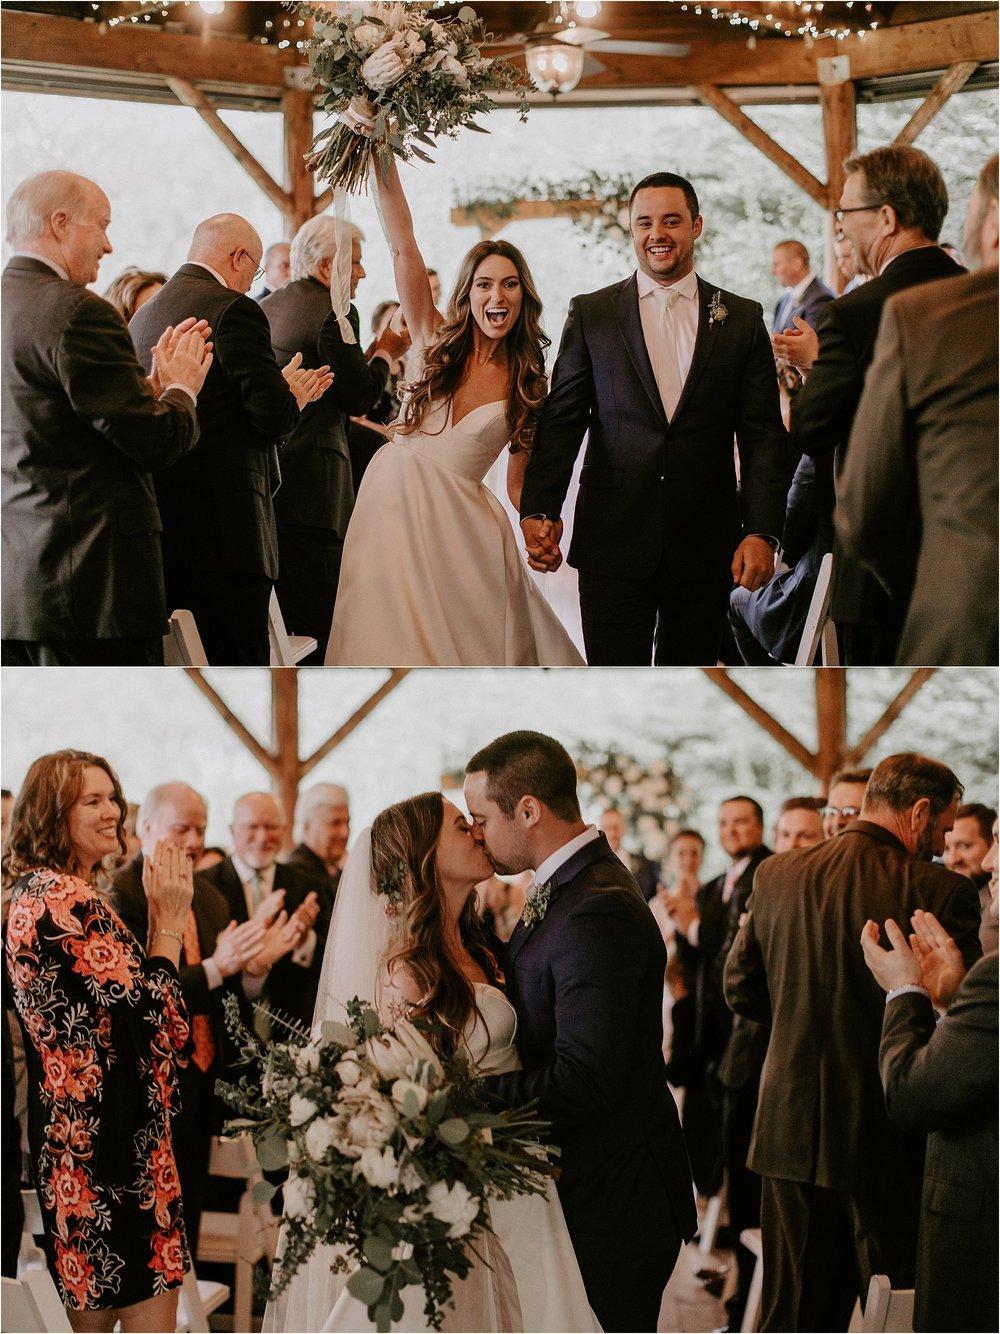 Sarah_Brookhart_Lancaster_PA_Wedding_Photographer_0054.jpg